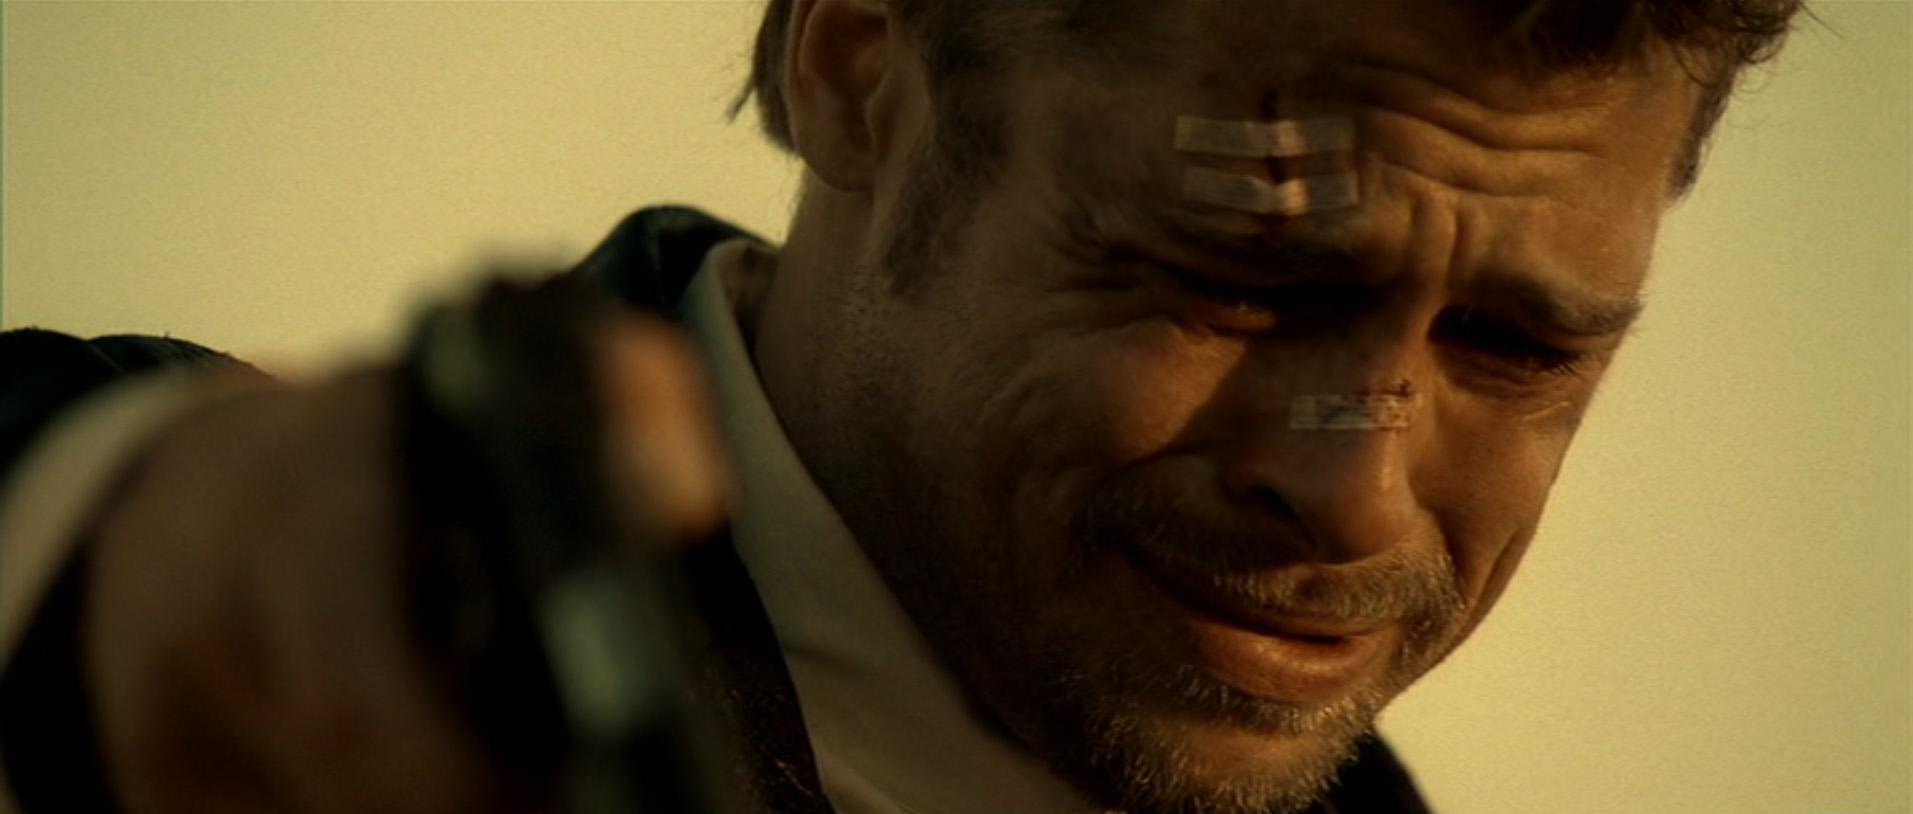 High Quality Brad Pitt 7 Whats In The Box Blank Meme Template